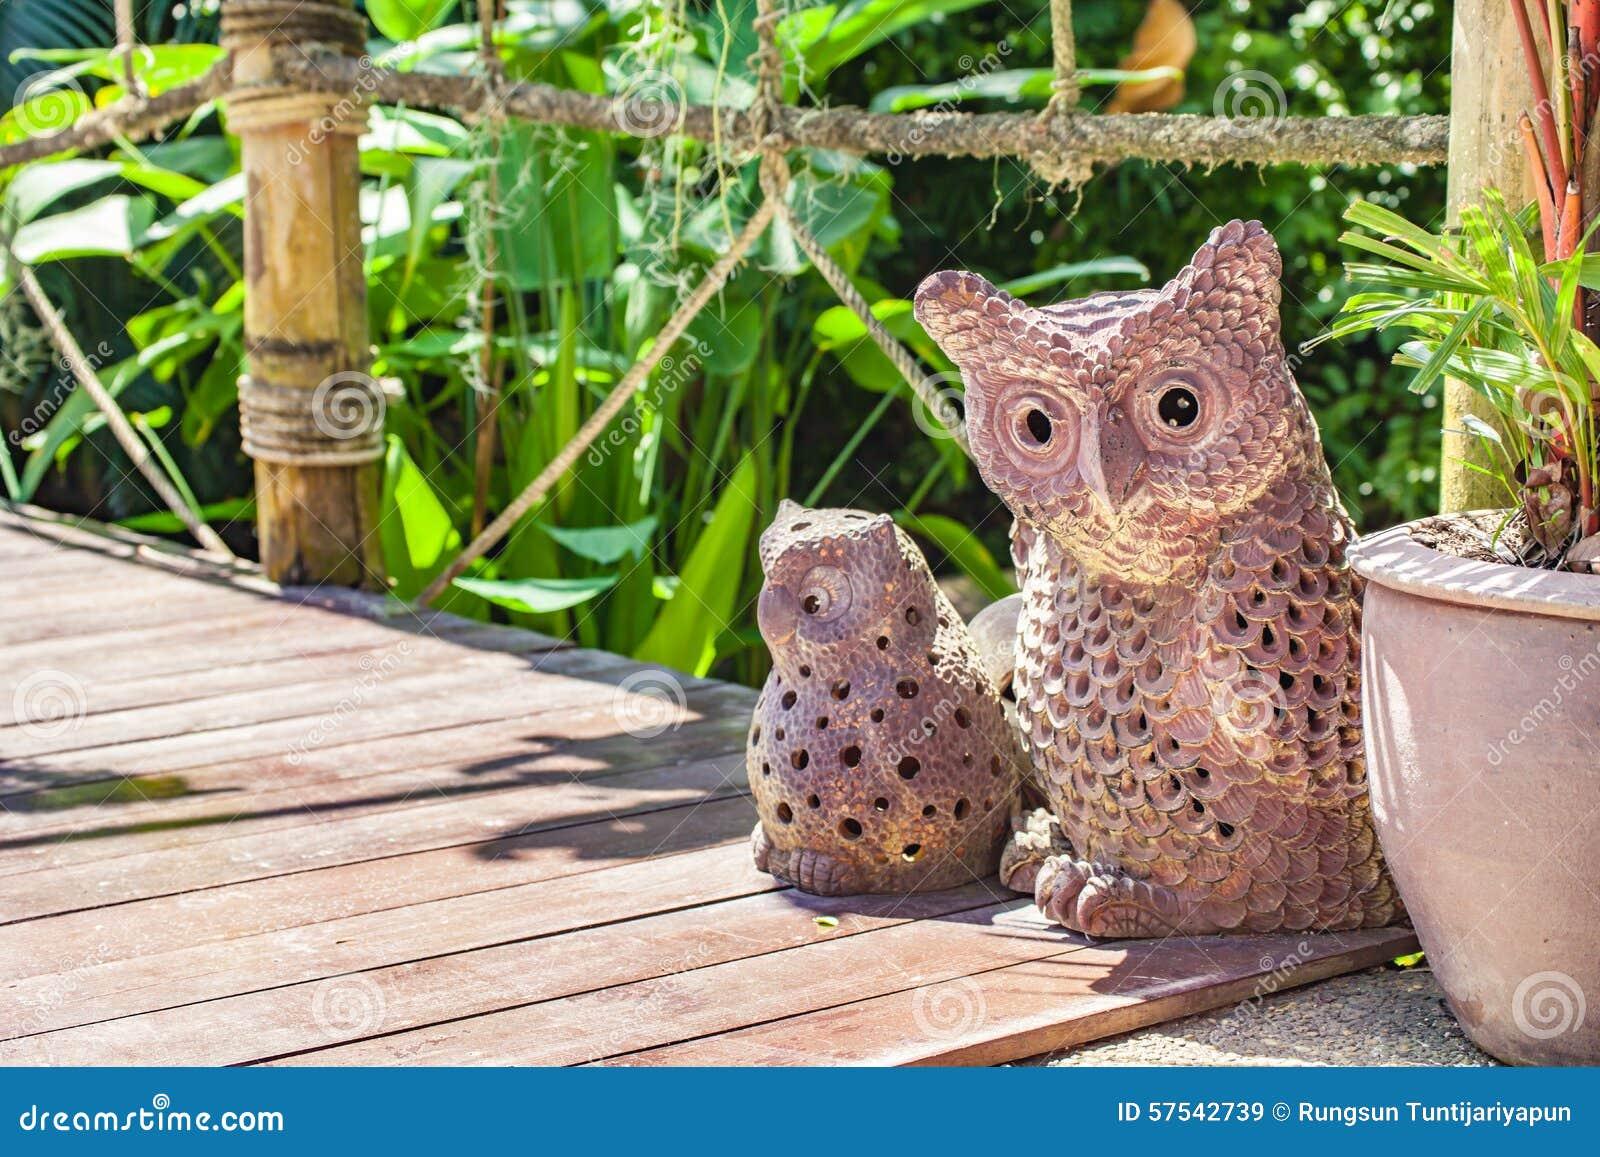 Download Owl Garden Decor Stock Image. Image Of Terracotta, Single    57542739